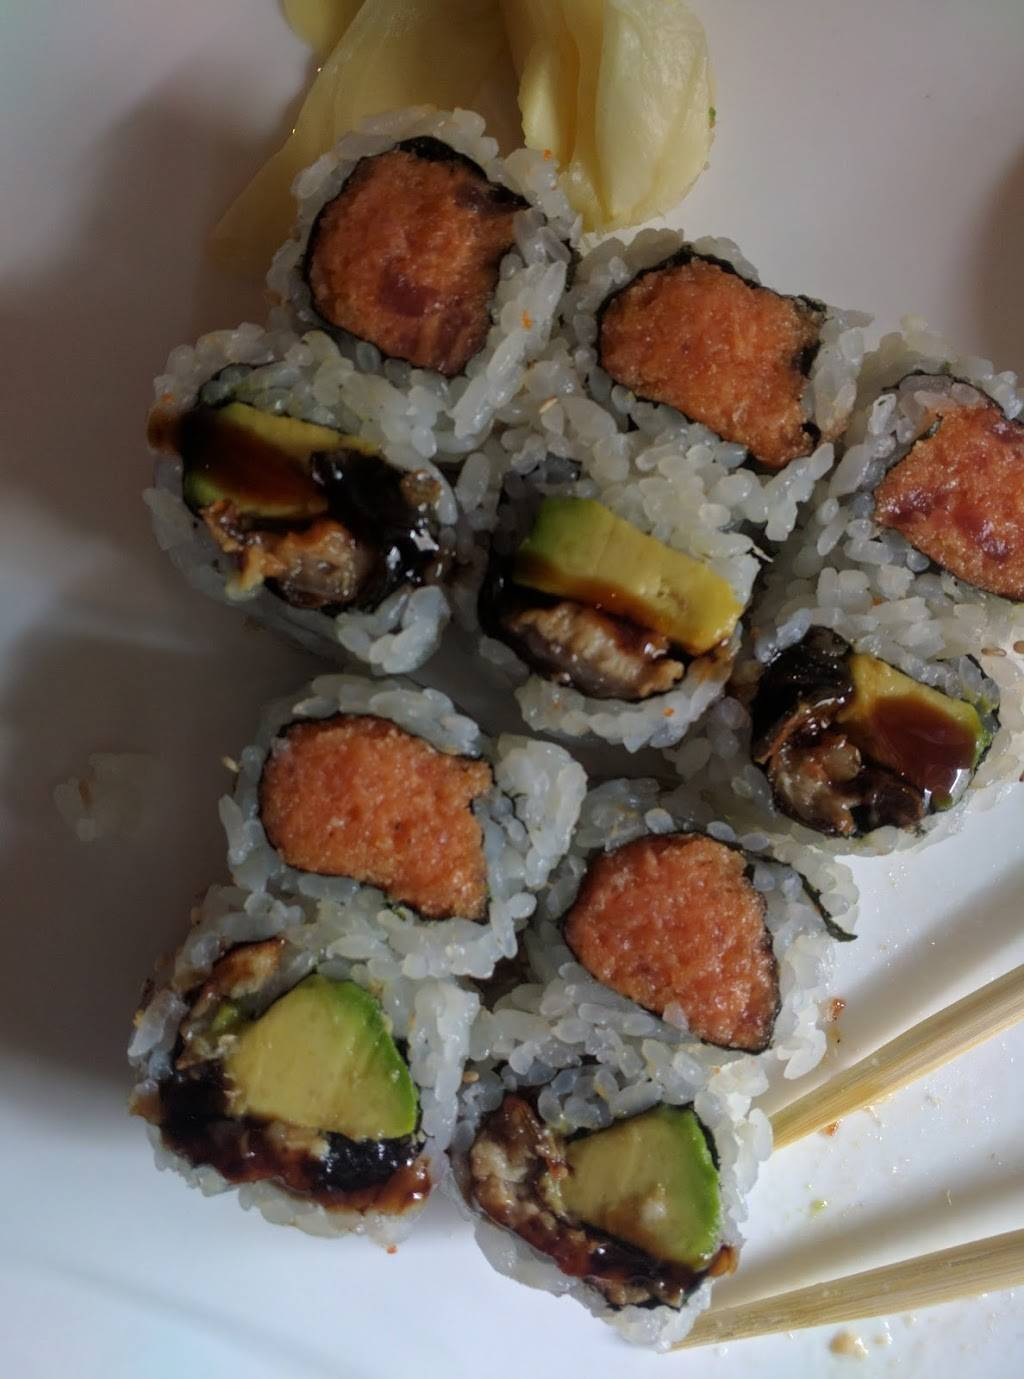 Akimoto Sushi | restaurant | 187 Church St, New York, NY 10007, USA | 2127663350 OR +1 212-766-3350